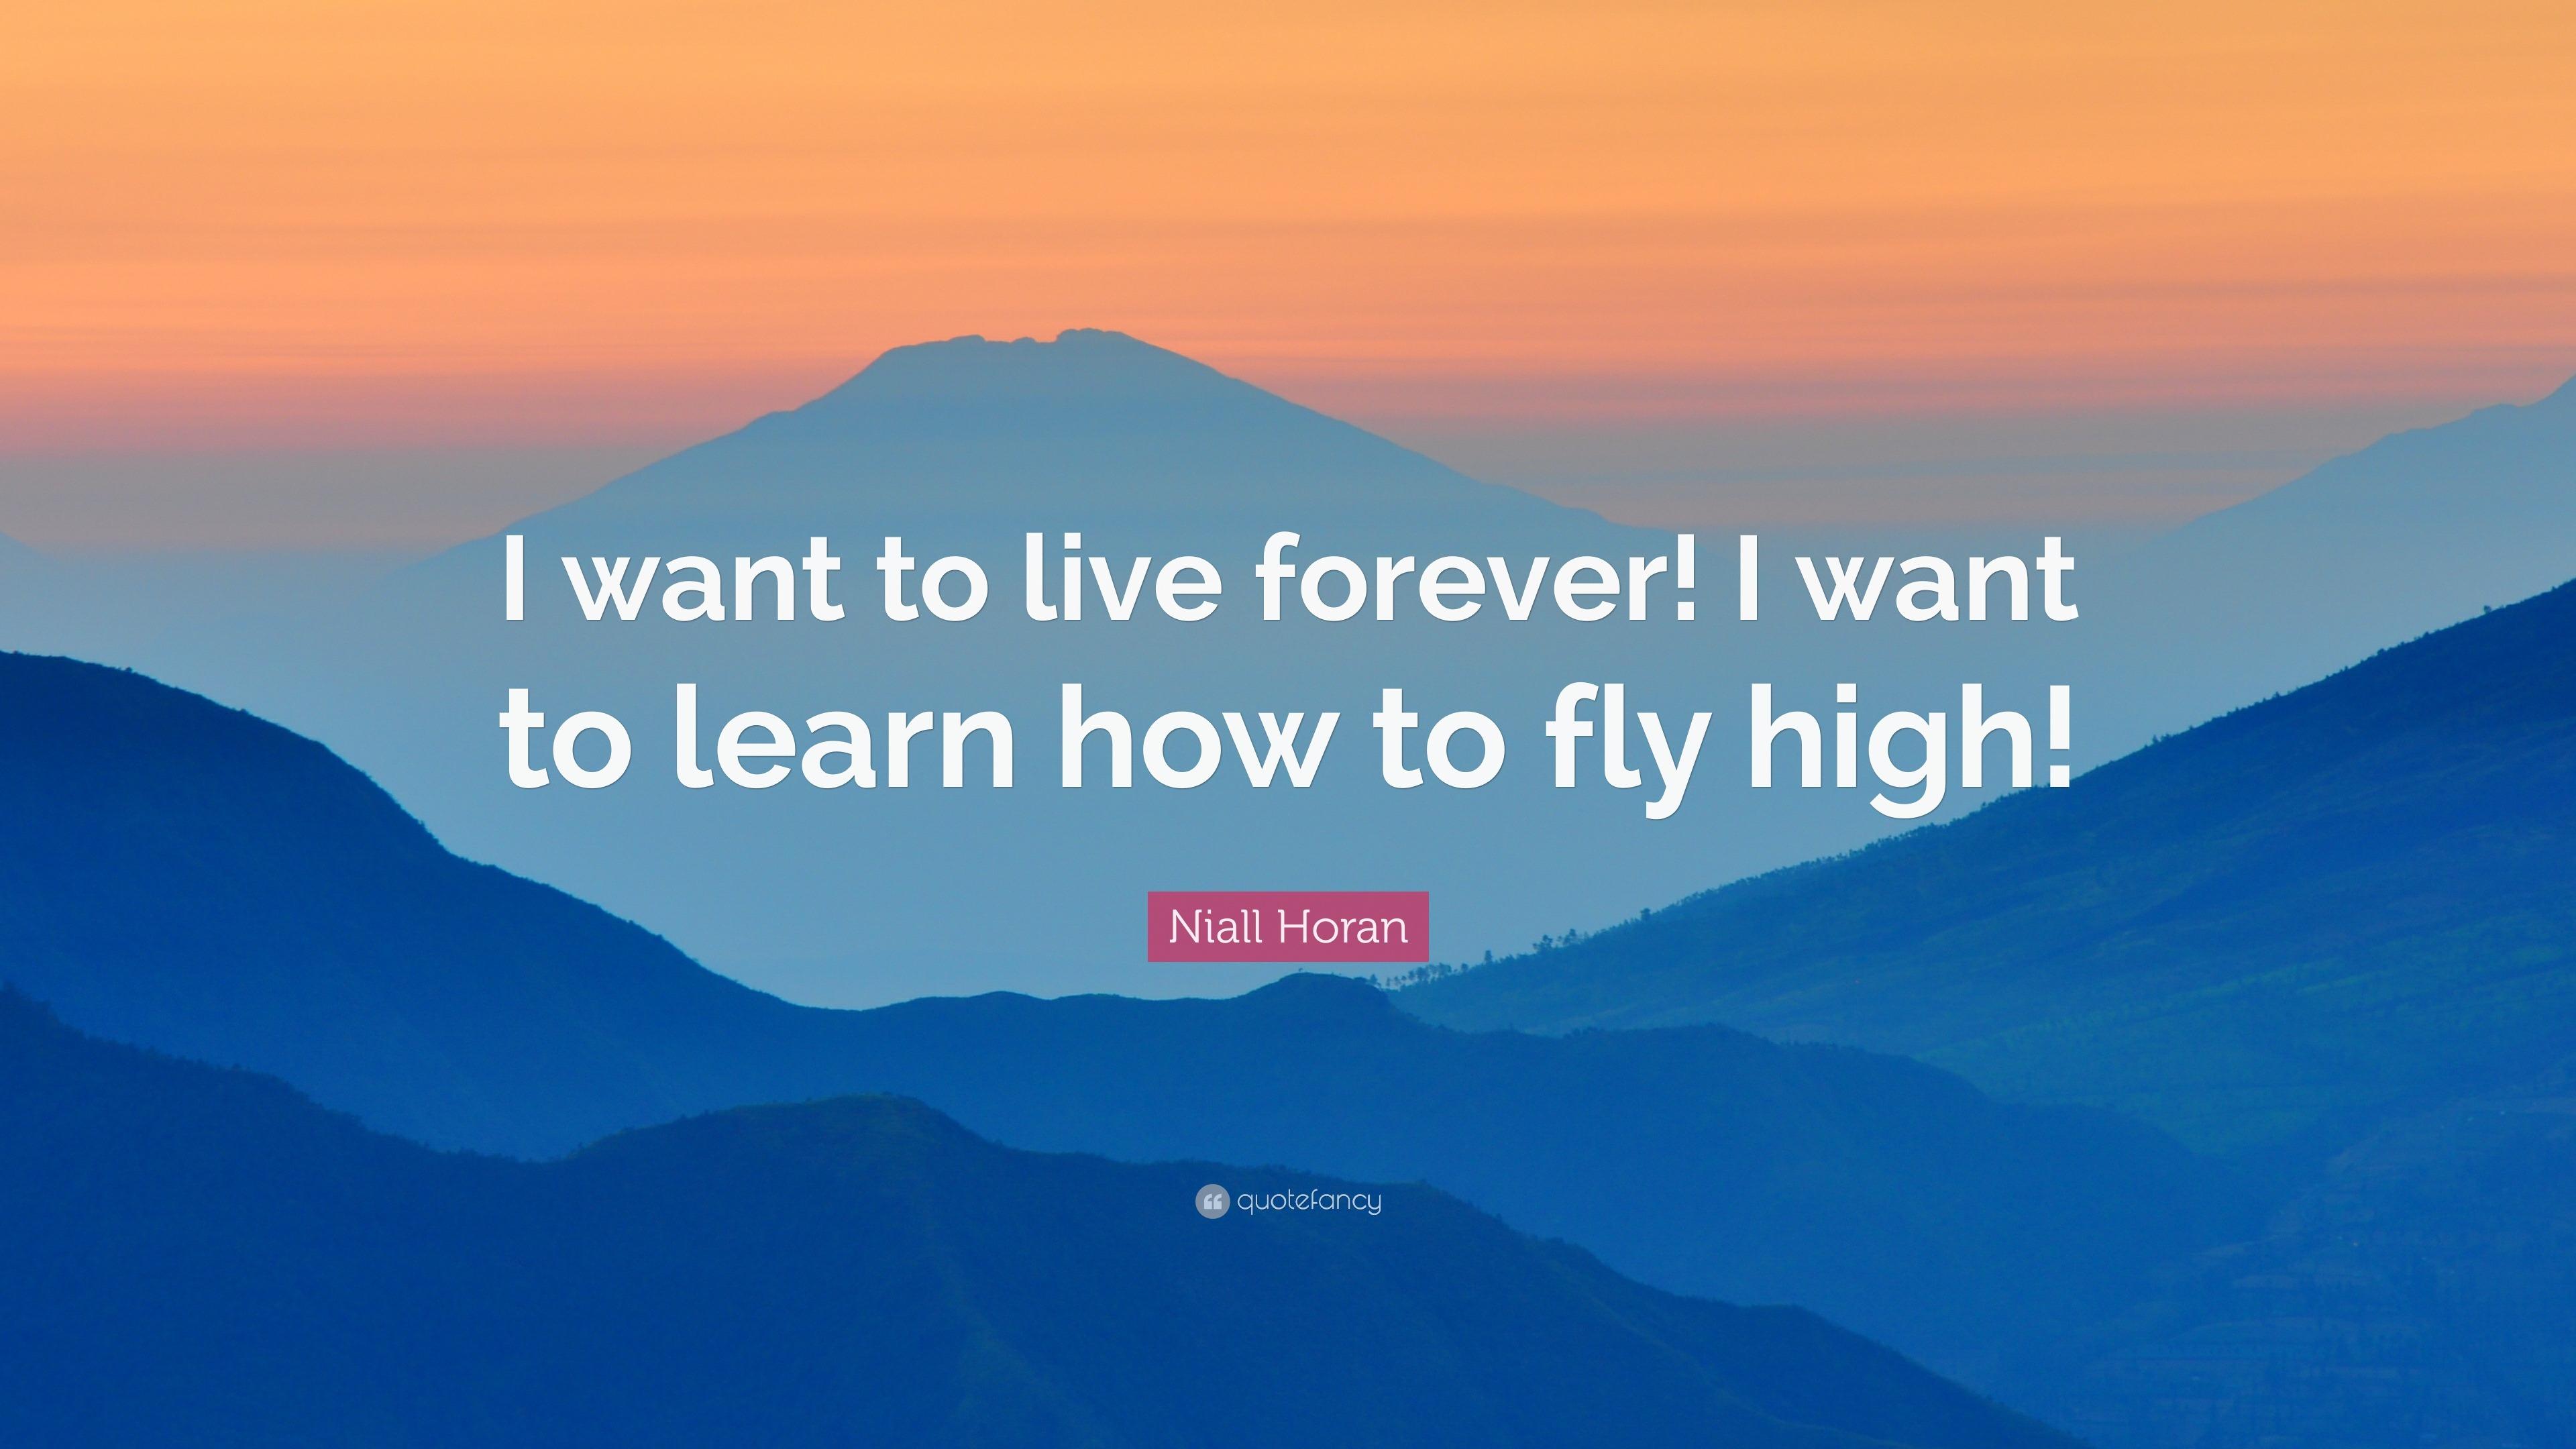 SONIQUE - Fly high ( Sky ) Lyrics - YouTube